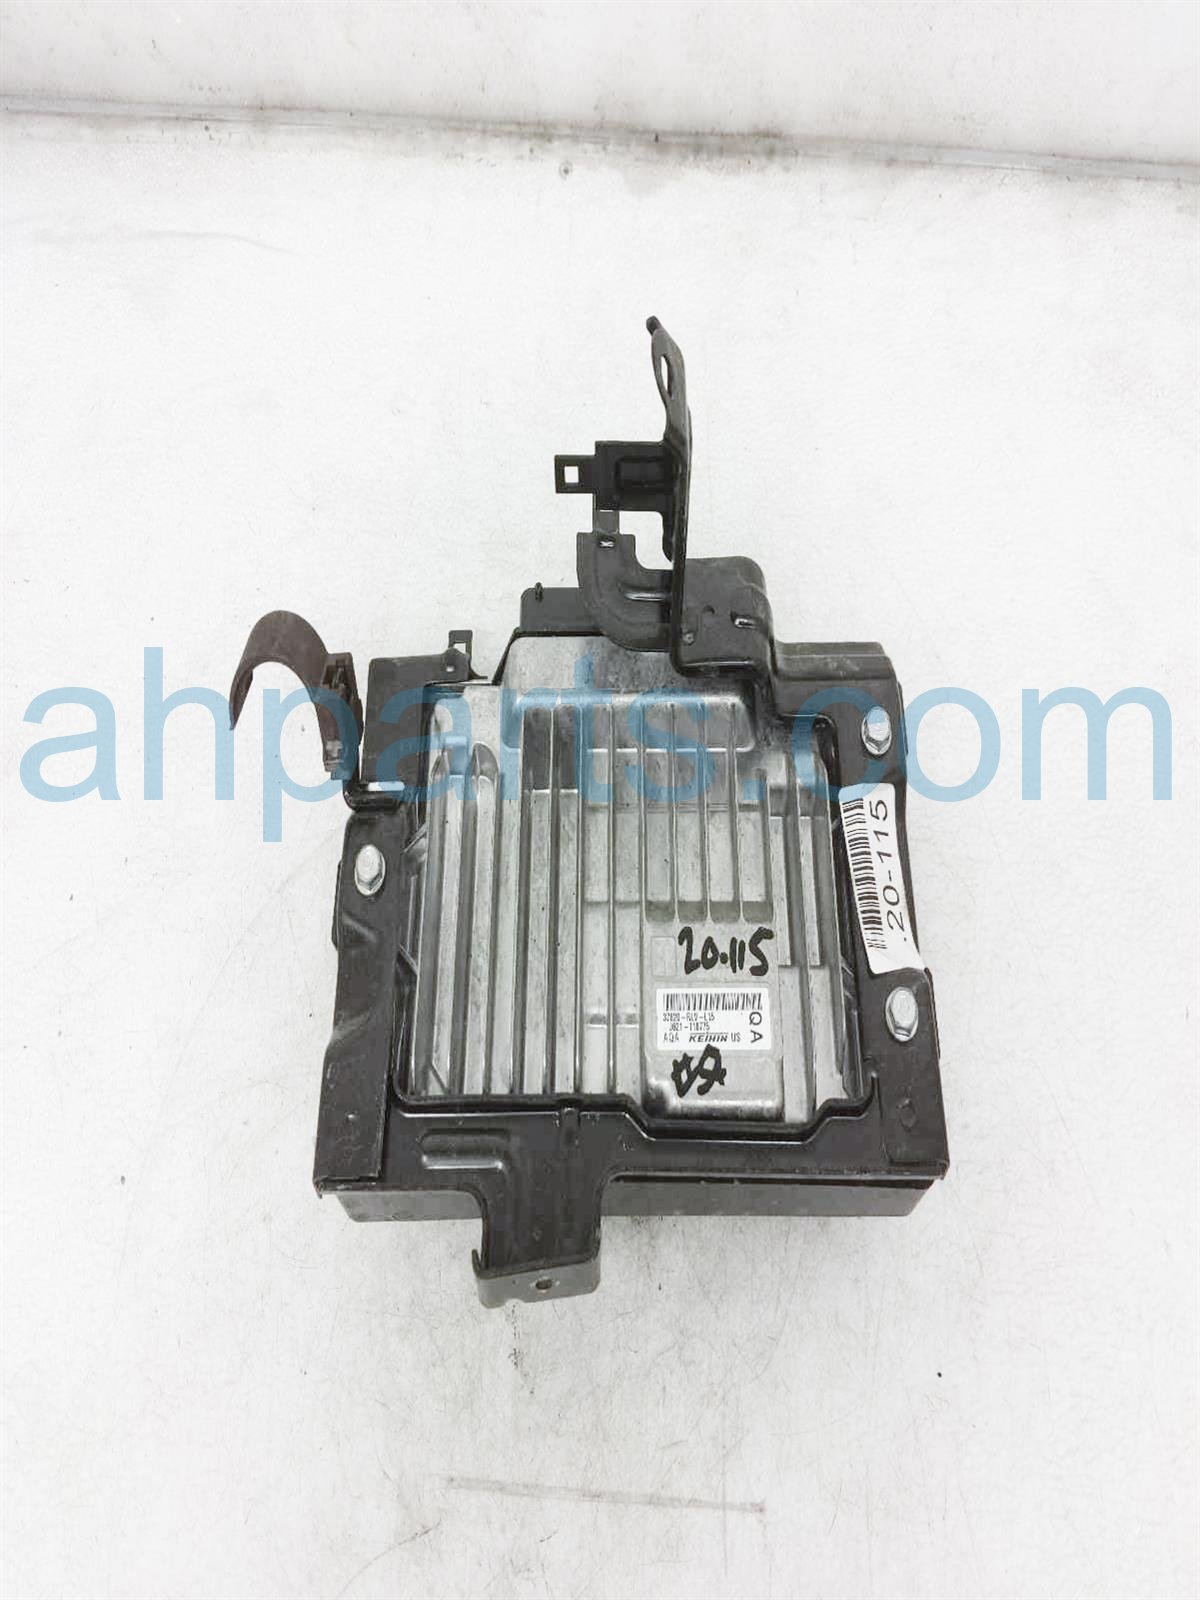 2019 Honda Passport Ecu Control Module / Engine Computer Unit   At 37820 RLV L15 Replacement